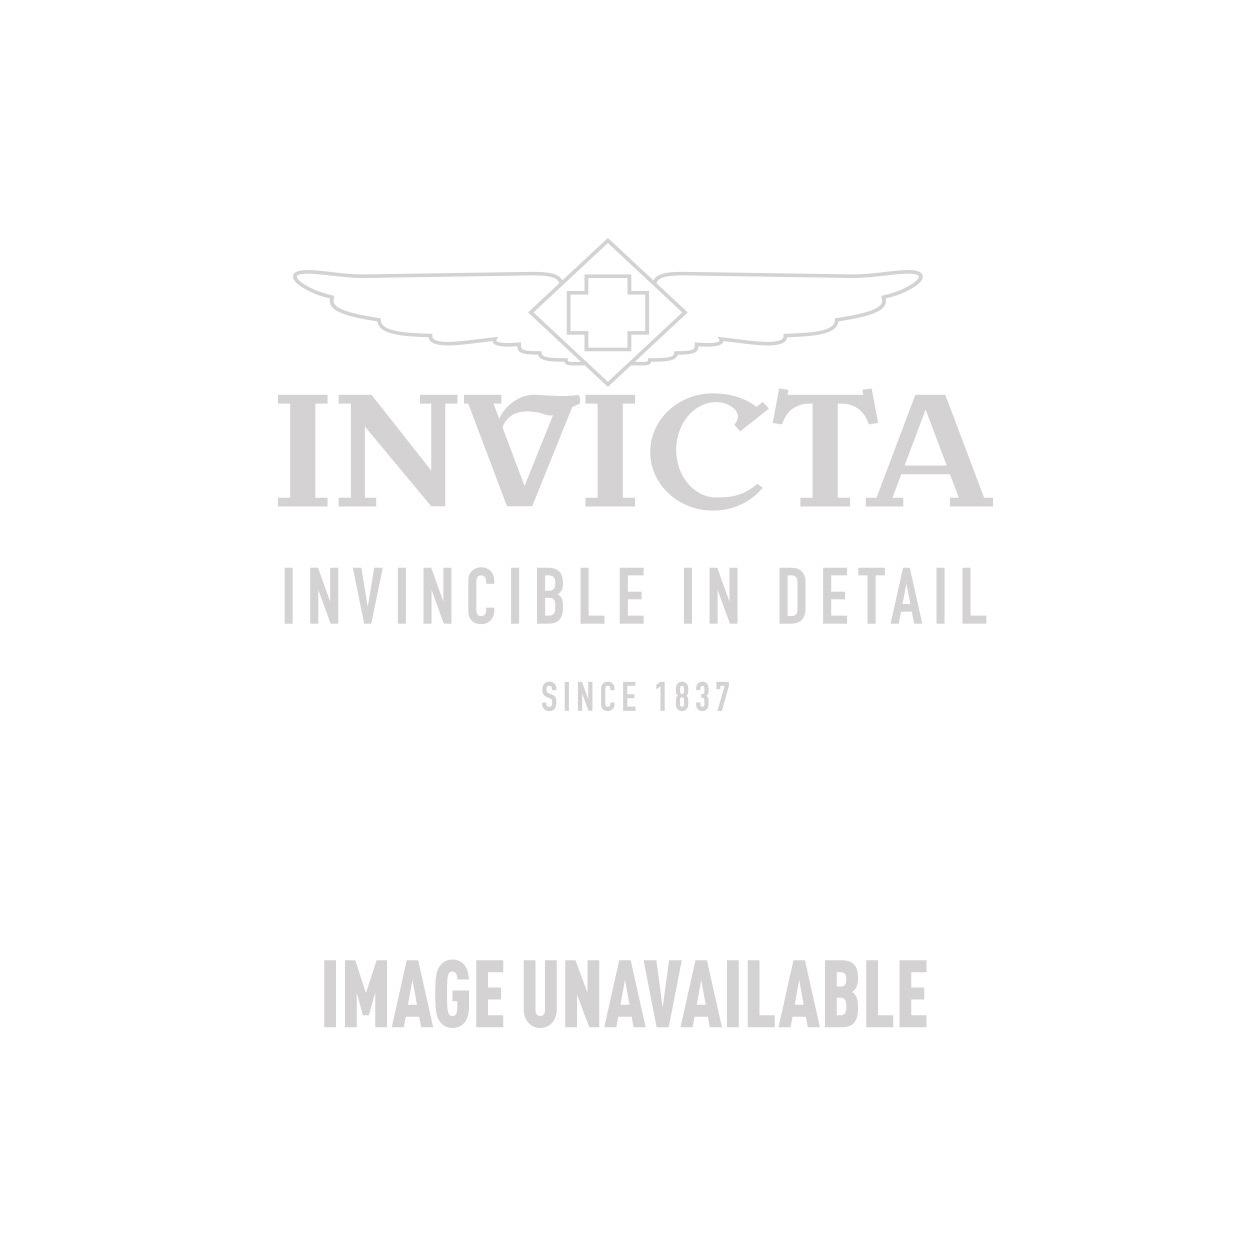 Invicta Subaqua Swiss Made Quartz Watch - Gold case with Black tone Leather band - Model 90139